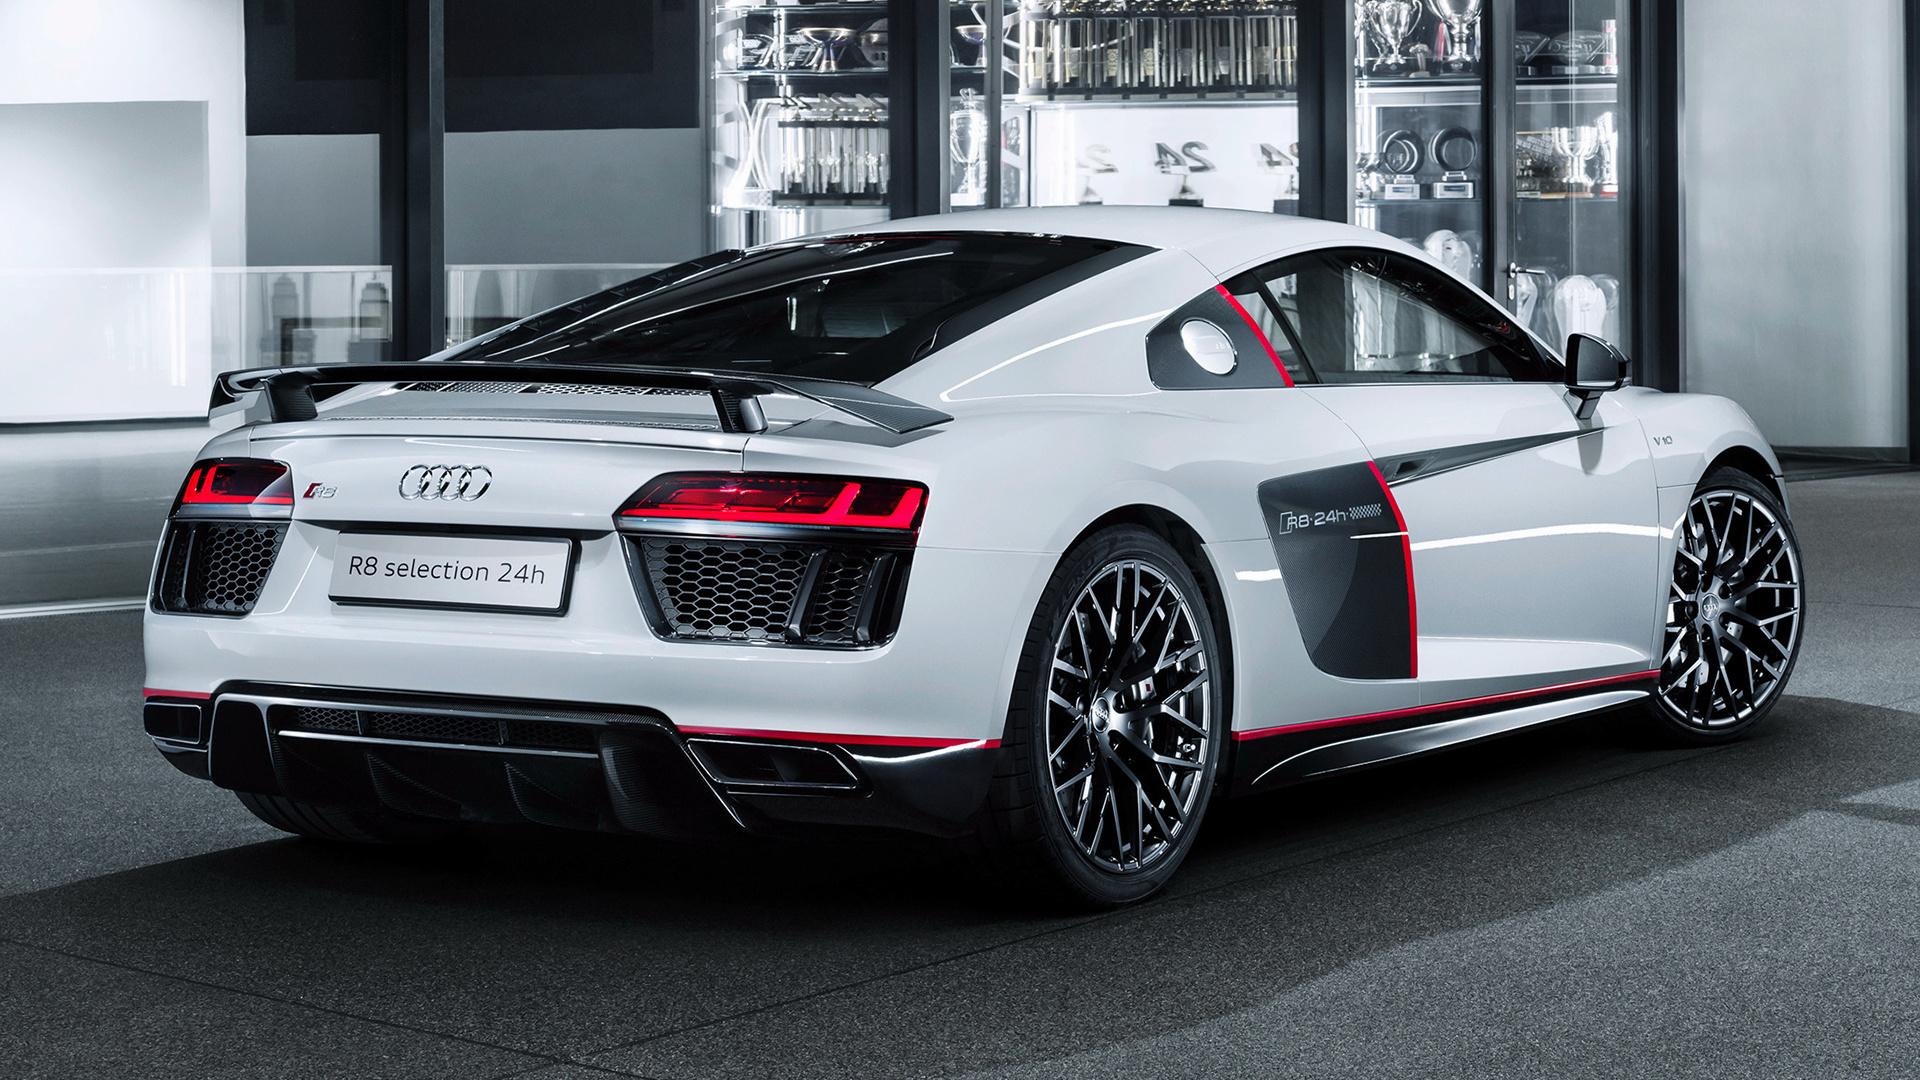 Eurocode Tuning Audi Wallpapers